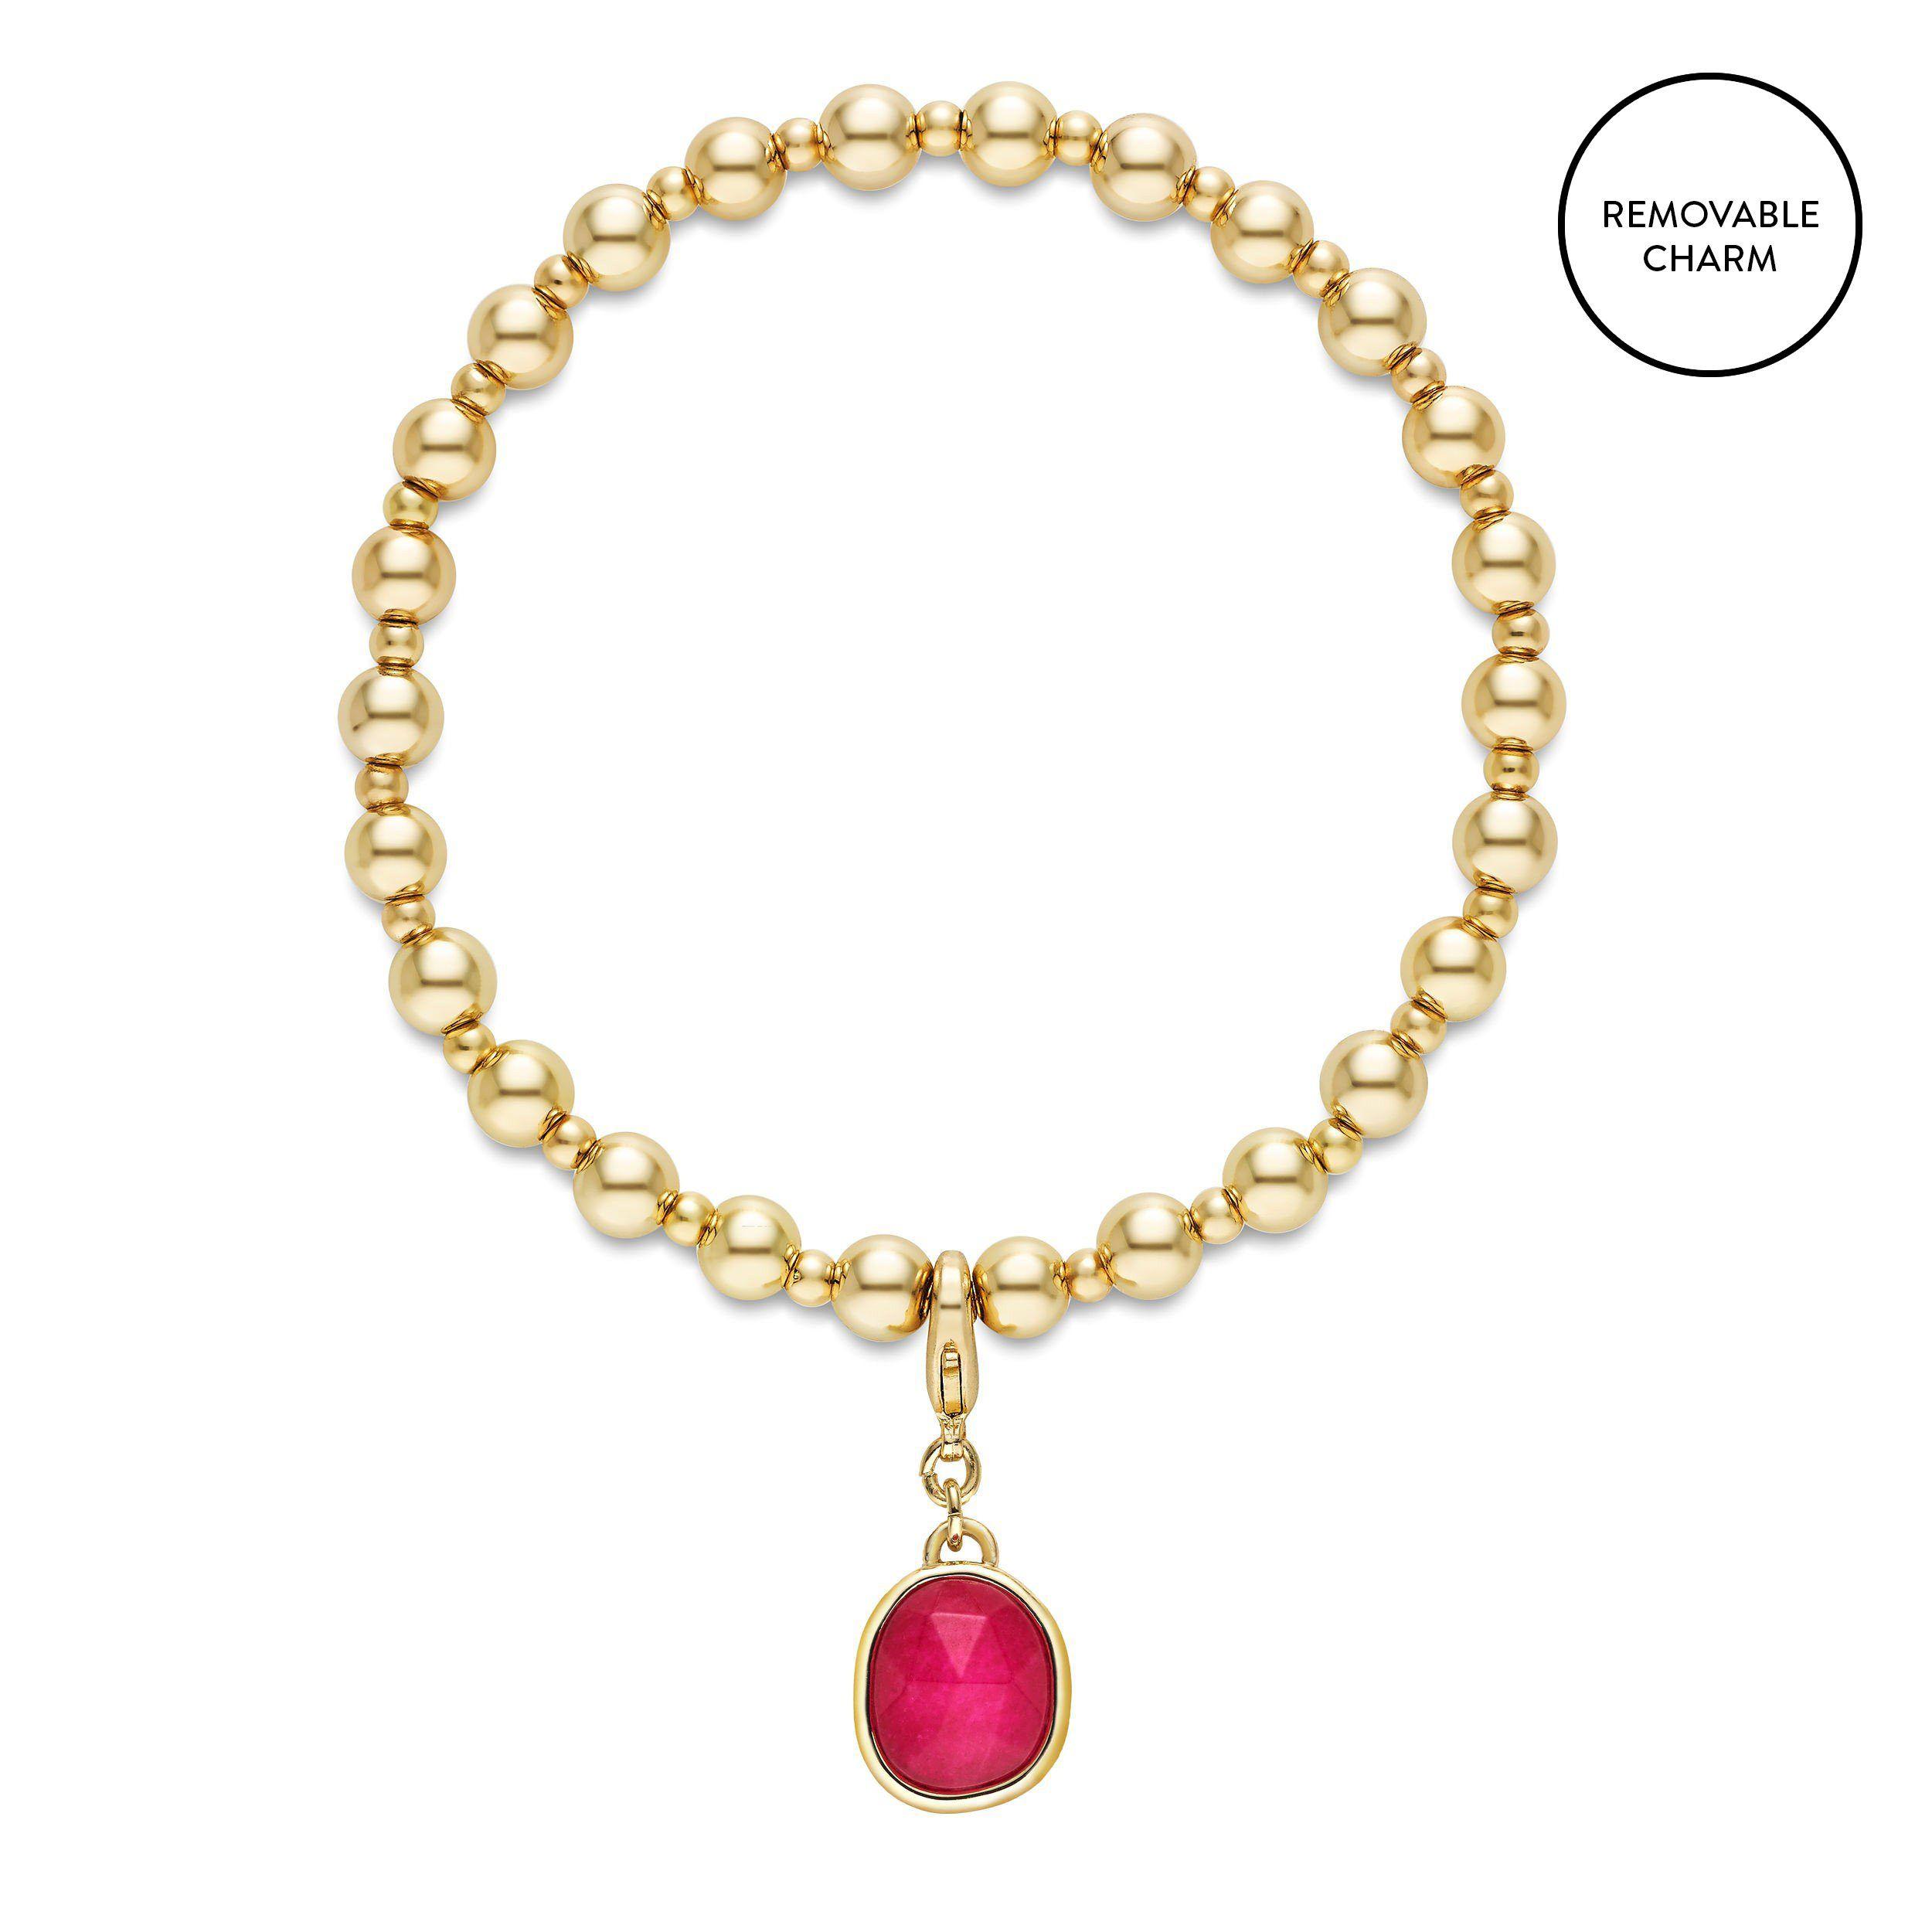 Fuschia Semi-Precious Charm Beaded Bracelet